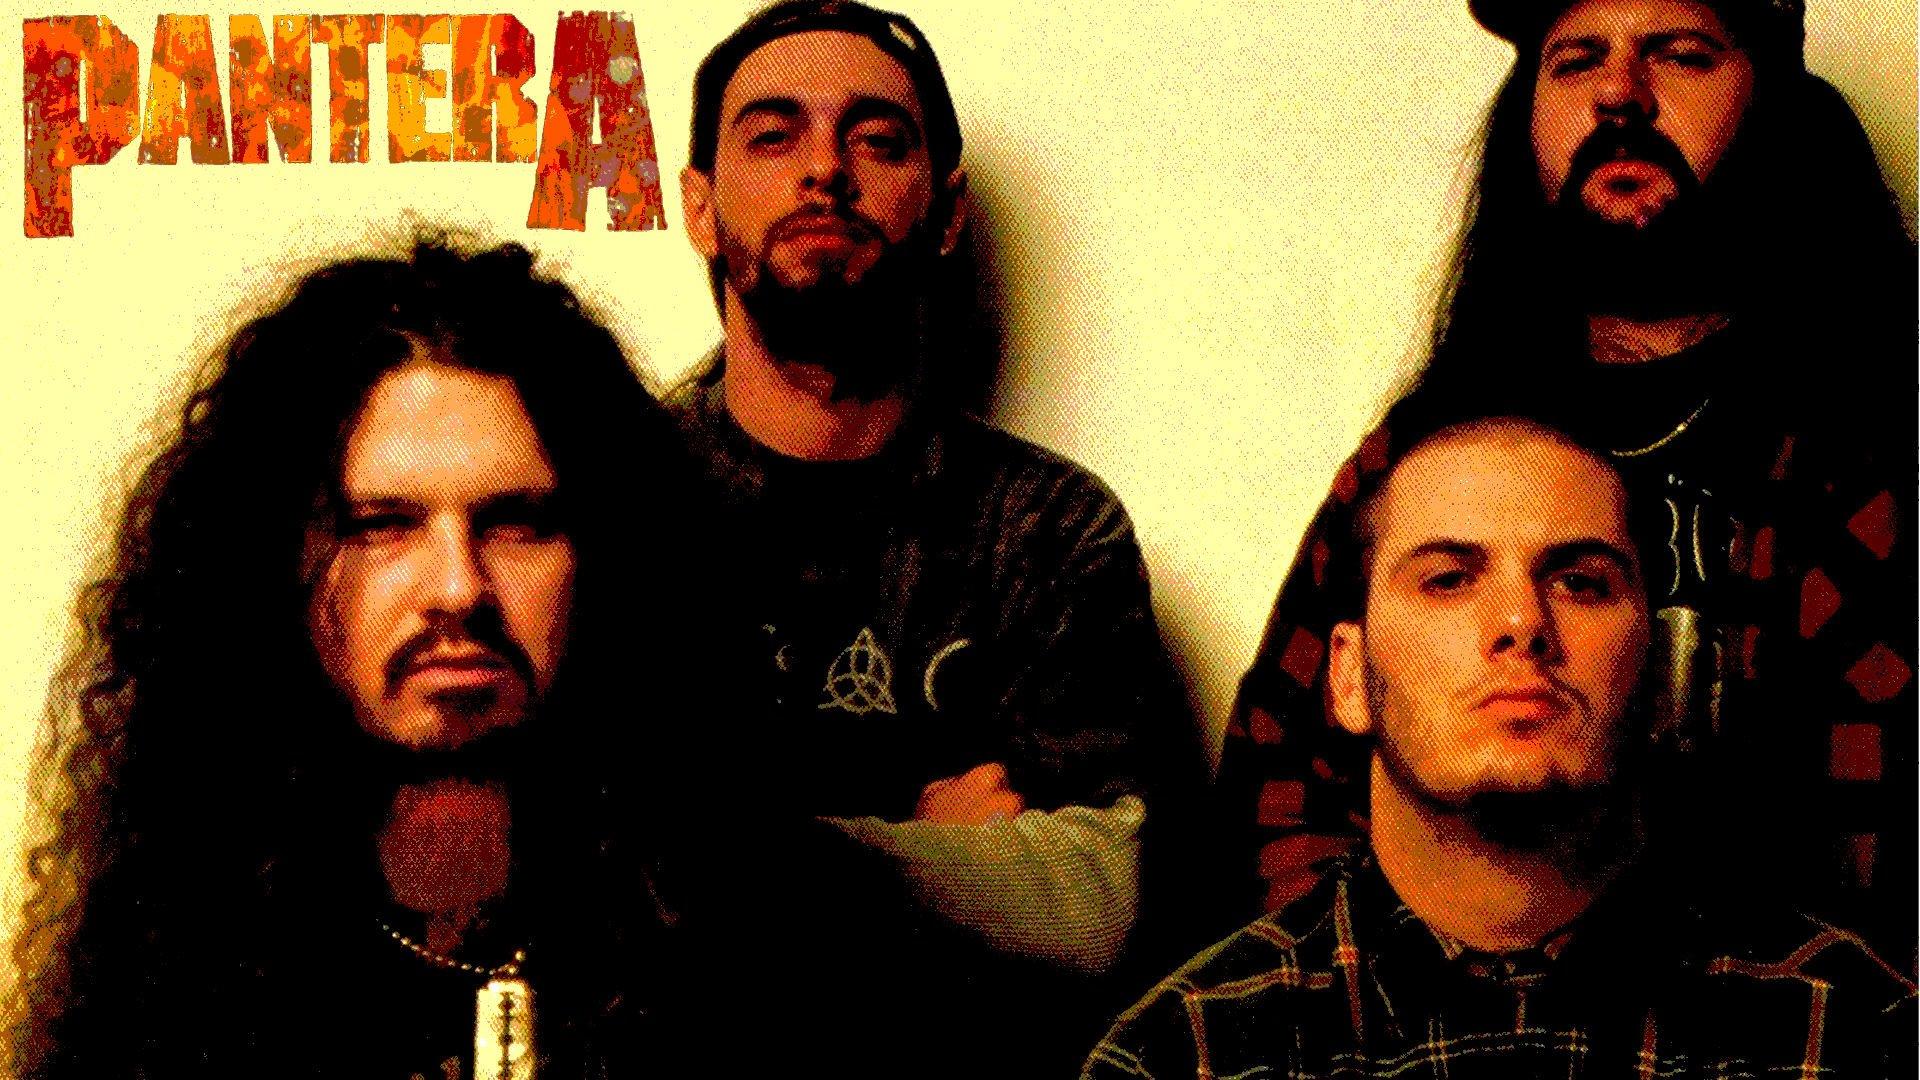 pantera thrash metal heavy poster fs wallpaper 1920x1080